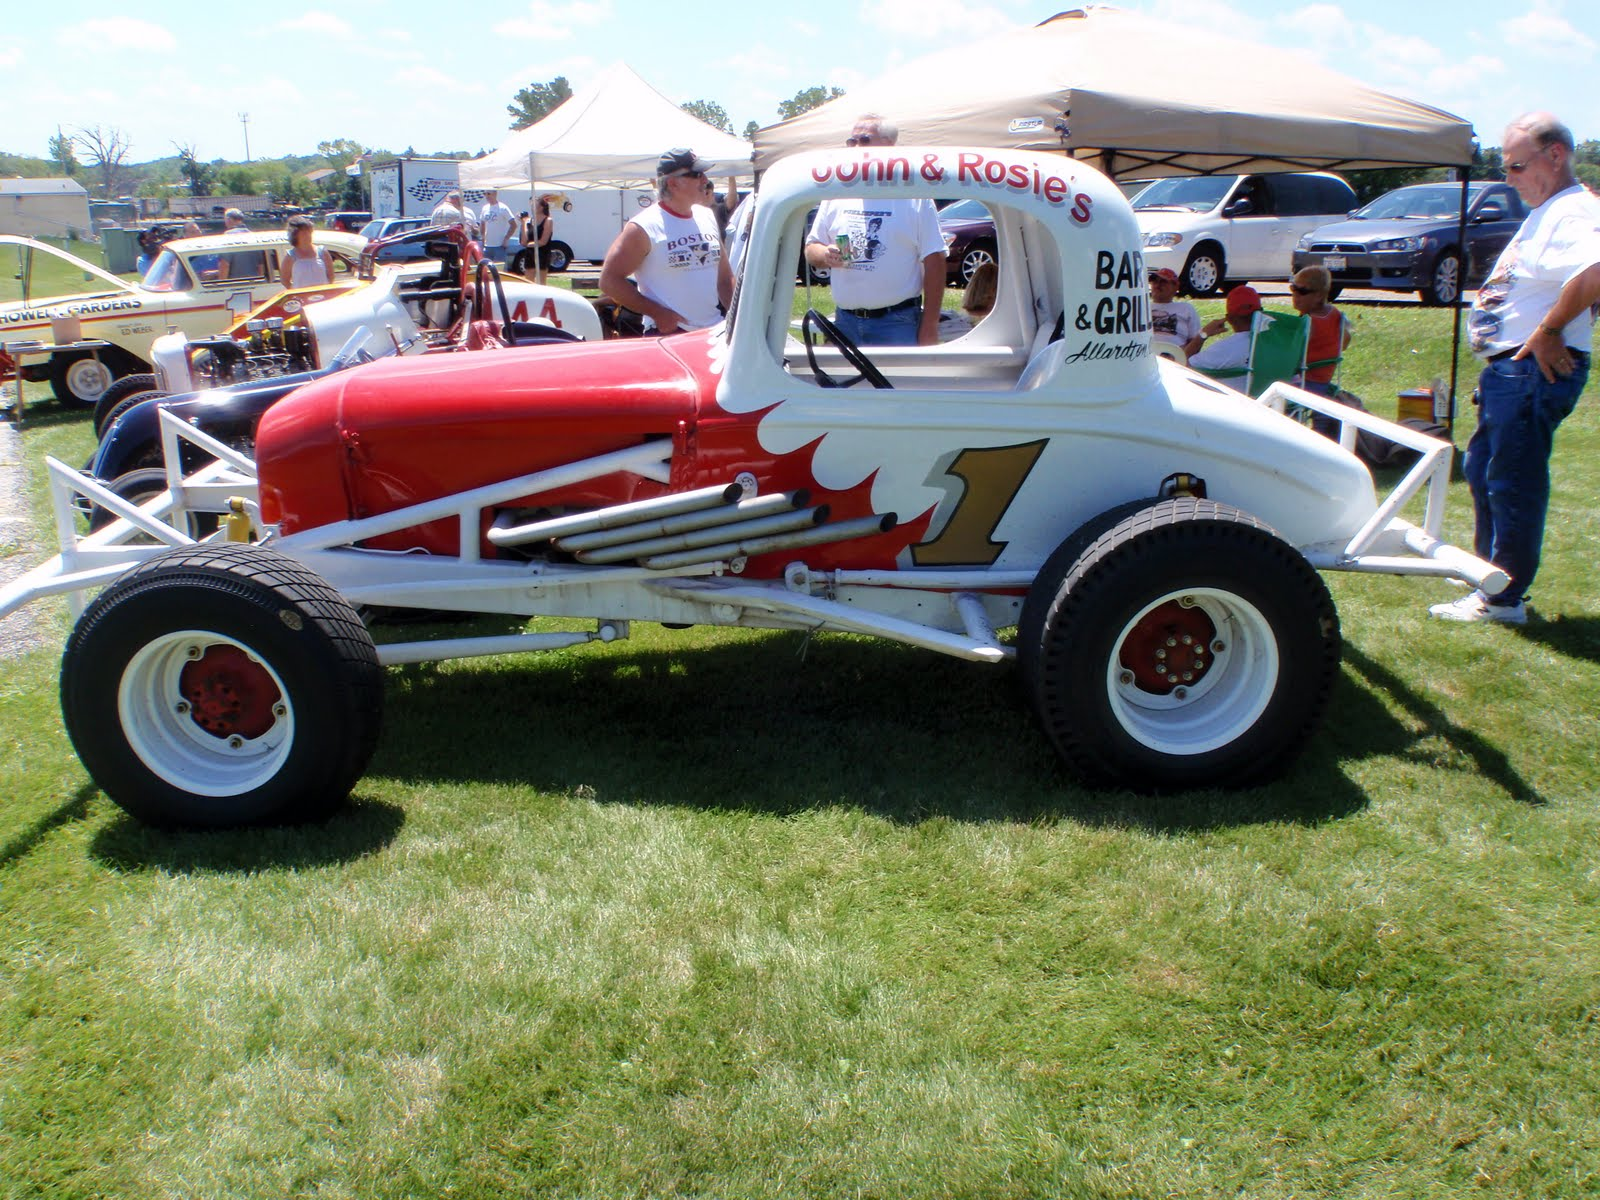 Craigslist Laughlin Nevada Cars